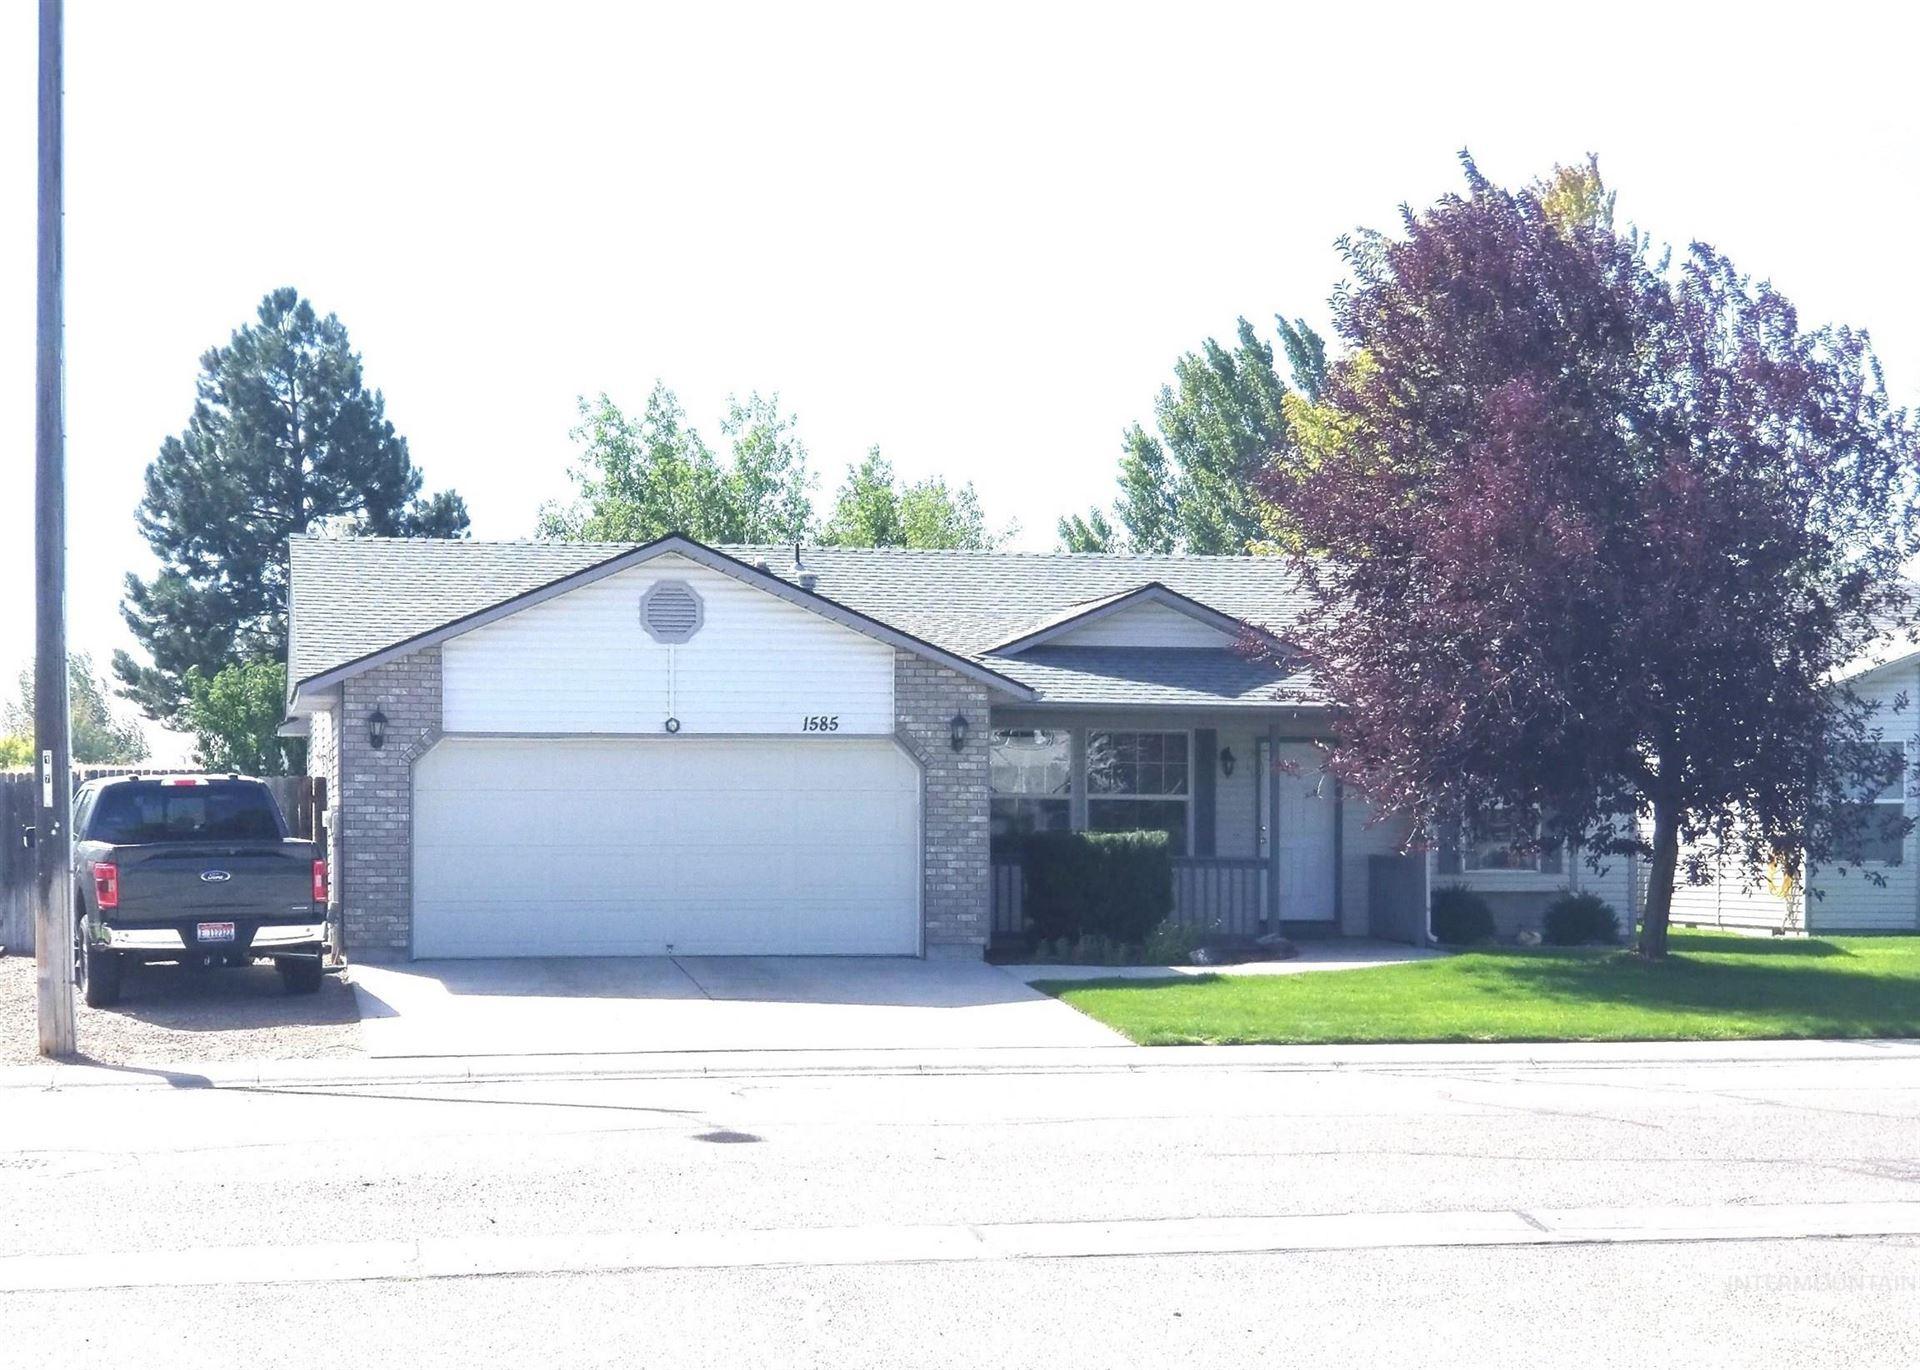 Photo of 1585 Targhee St., Mountain Home, ID 83647 (MLS # 98819434)